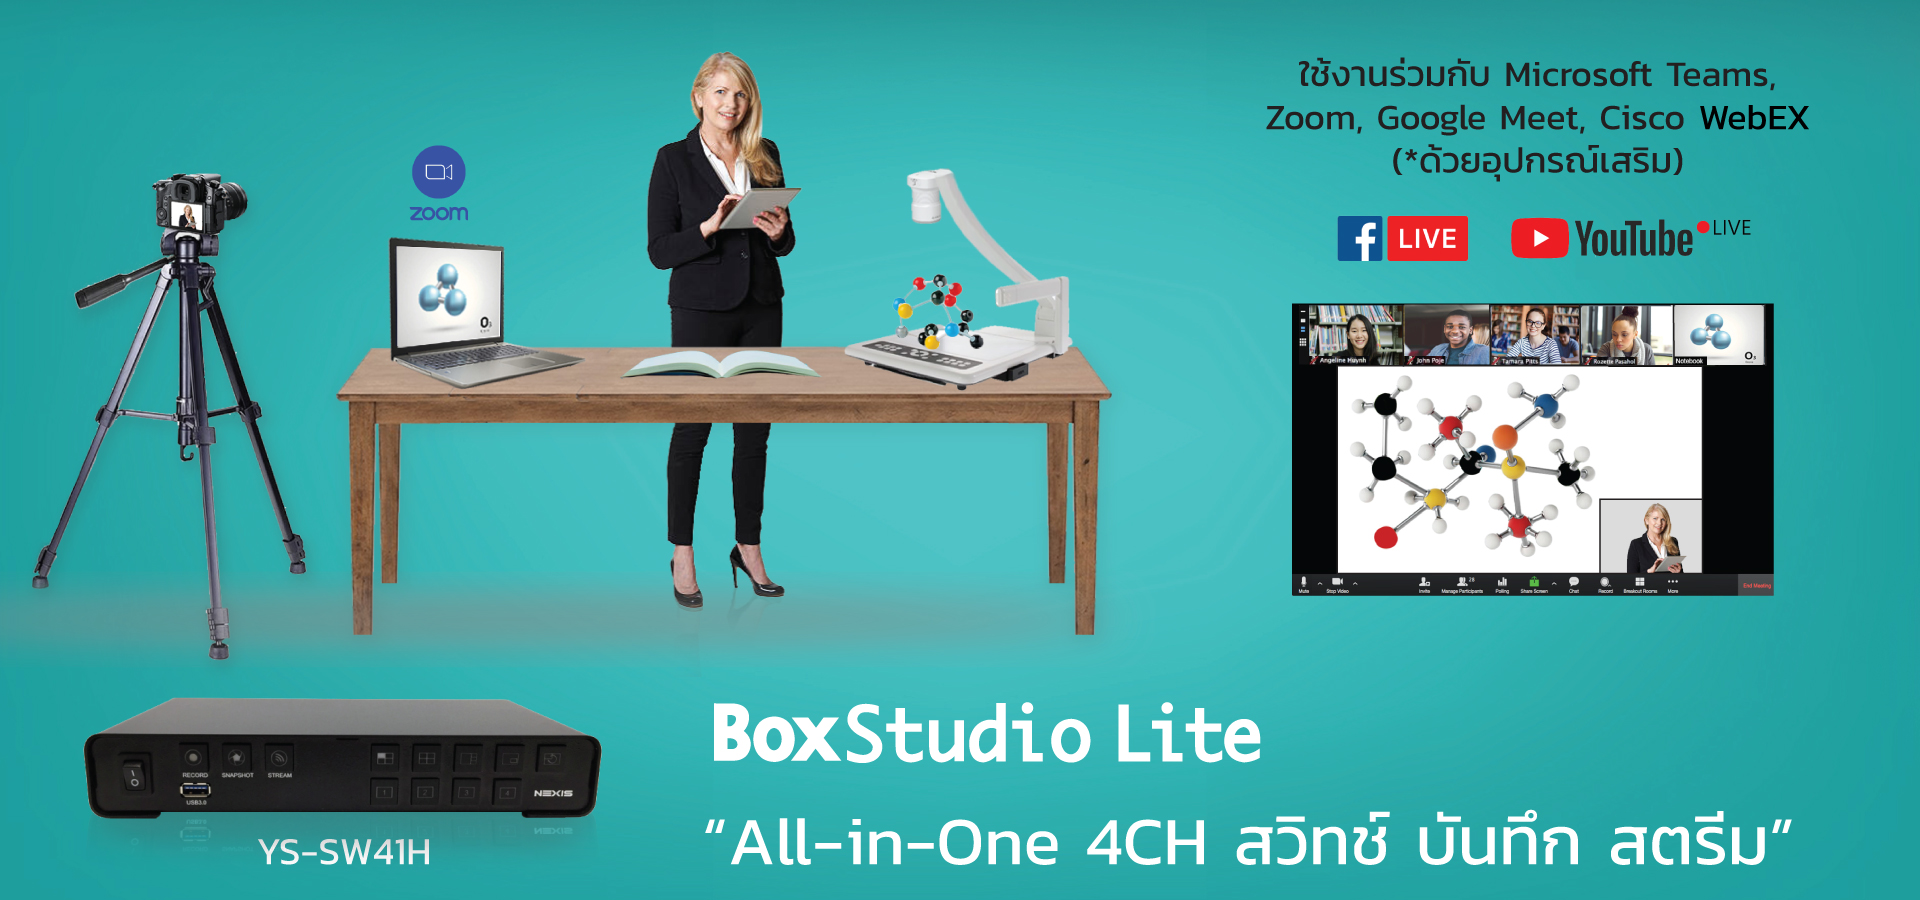 boxstudioMD-22.jpg